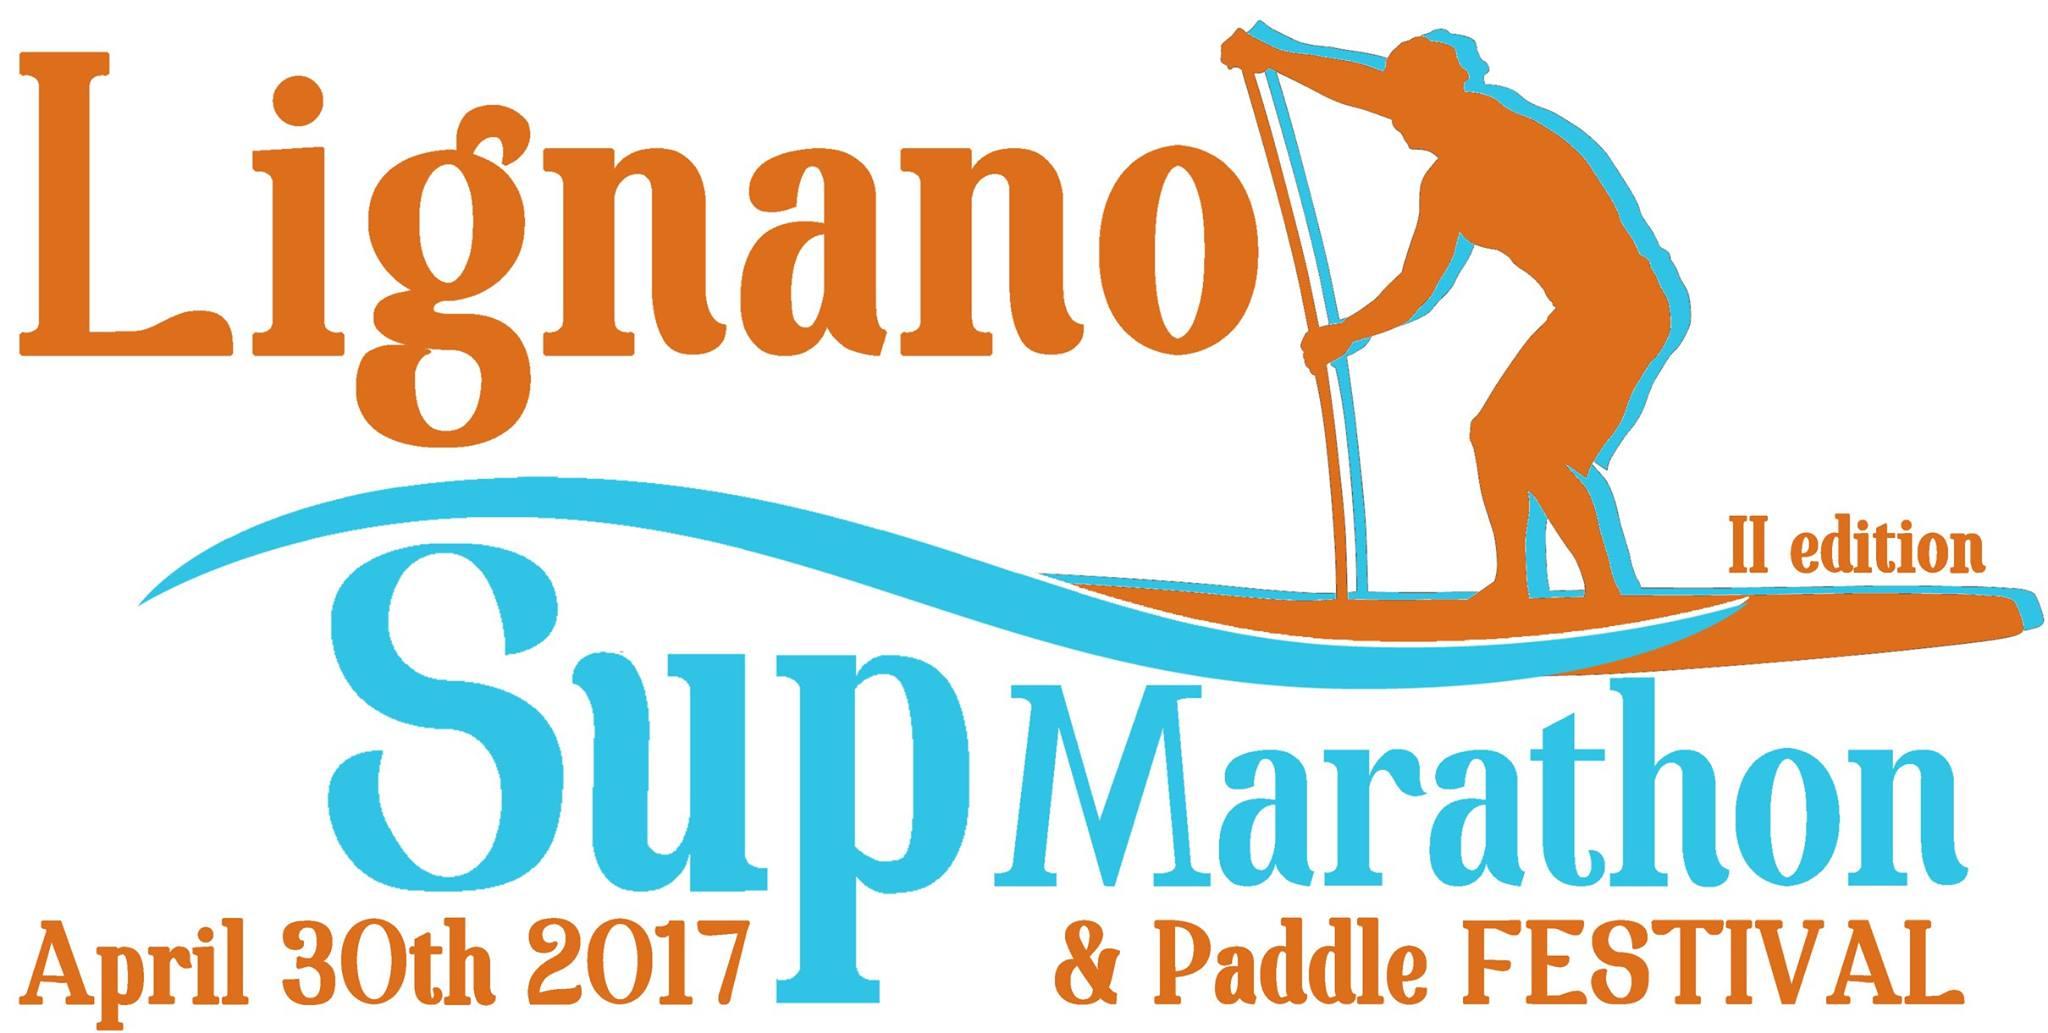 Sup-news-italia-2017-lignano-sup-marathon-04